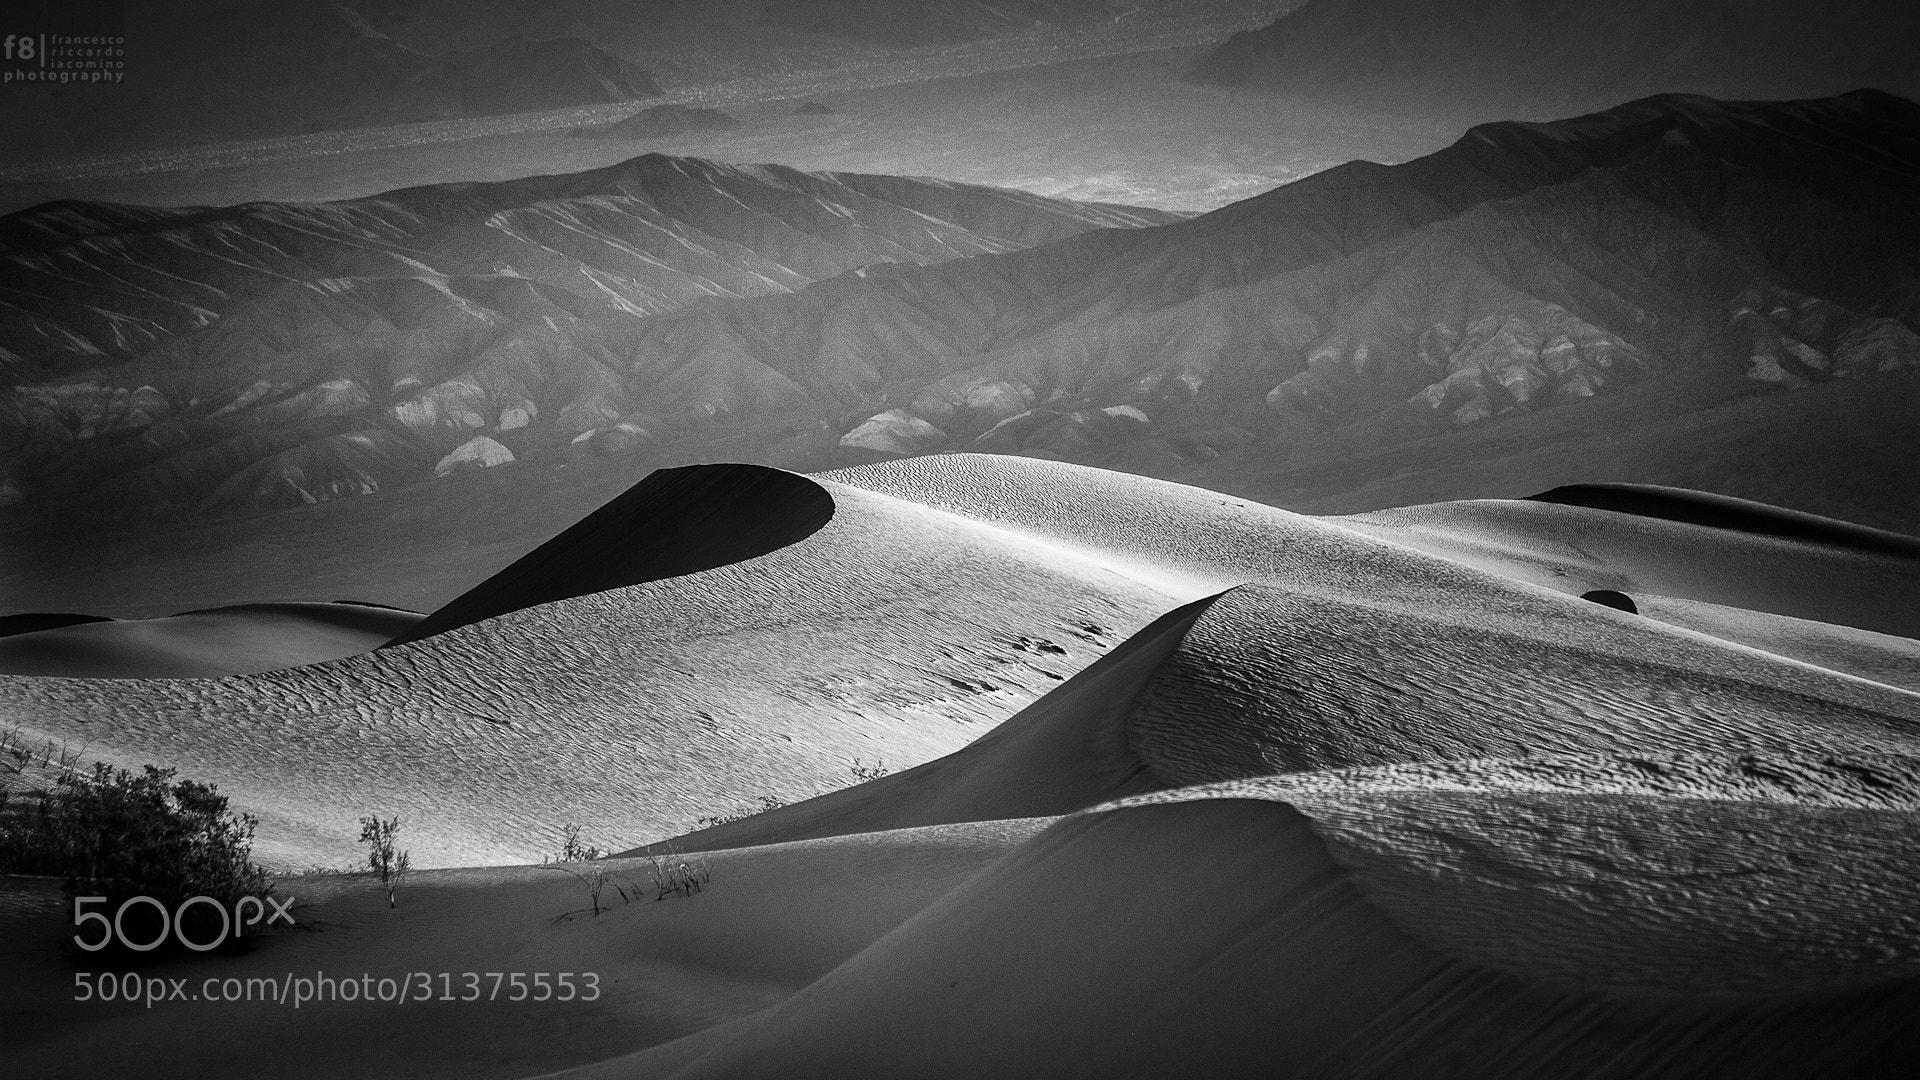 Photograph Death Valley by Francesco Riccardo Iacomino on 500px